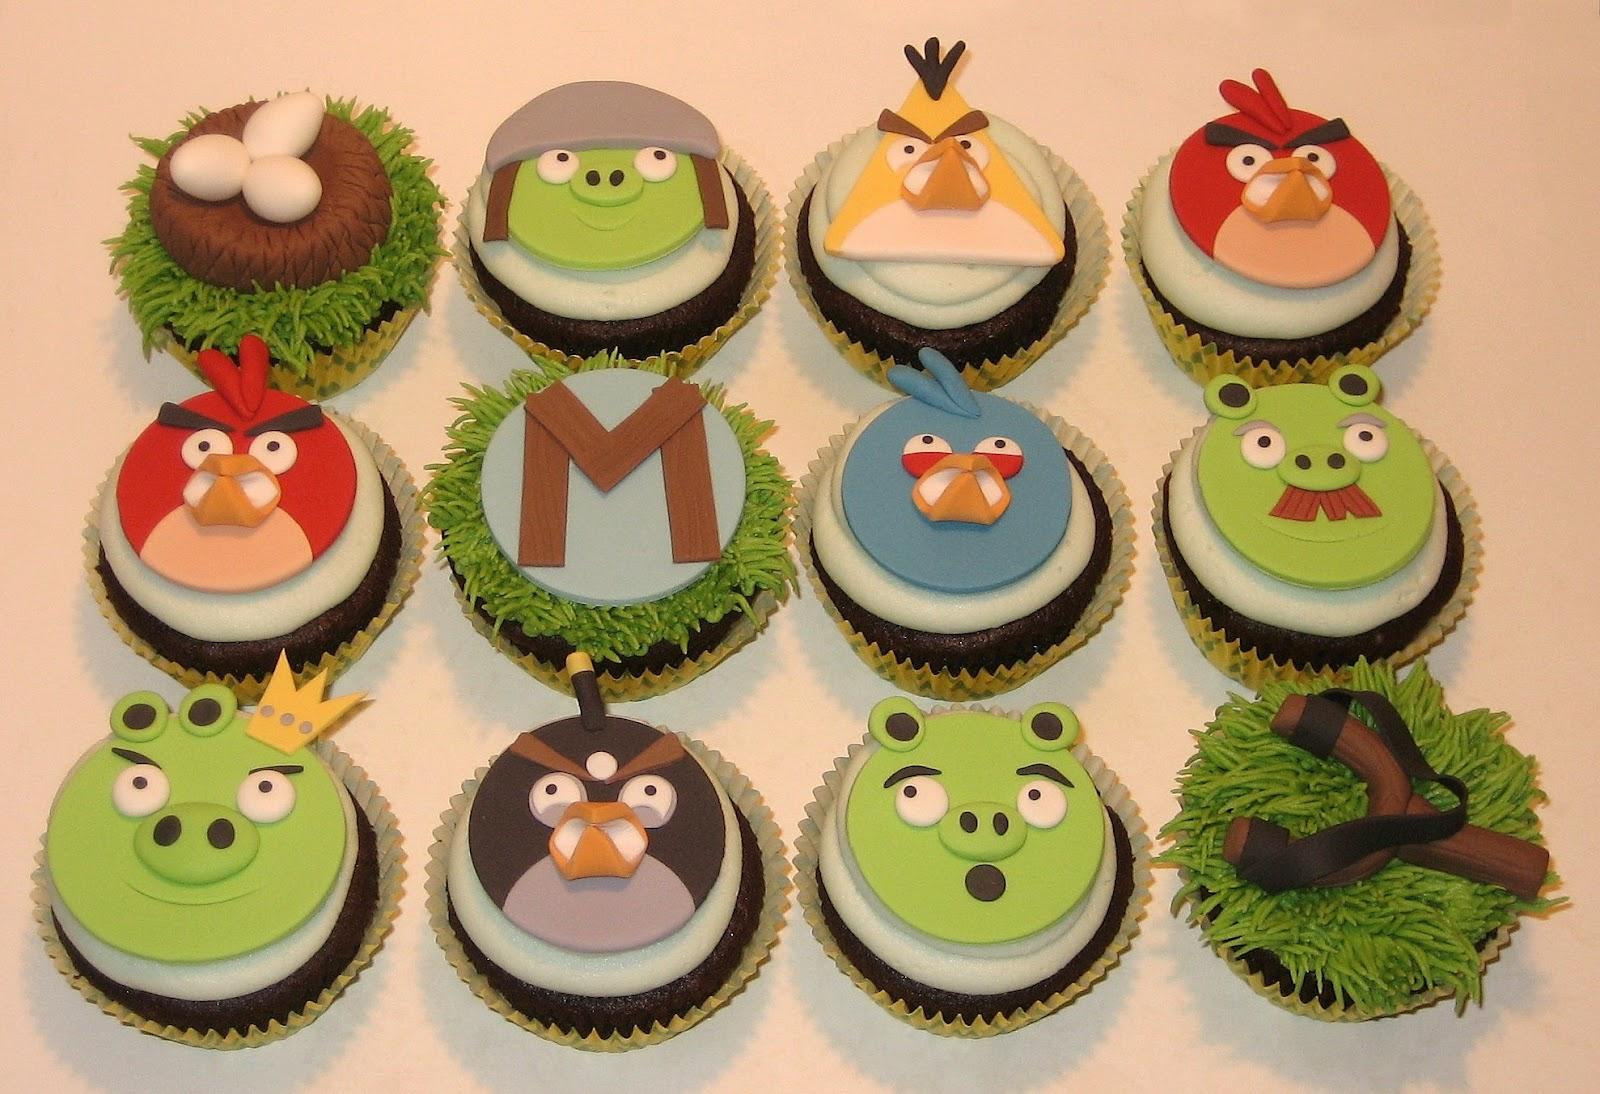 http://2.bp.blogspot.com/-k5ugivOxhfY/T3idGoogIPI/AAAAAAAACwA/5qF_kzLJp00/s1600/angry%2Bbirds%2Bcupcakes%2B2.jpg